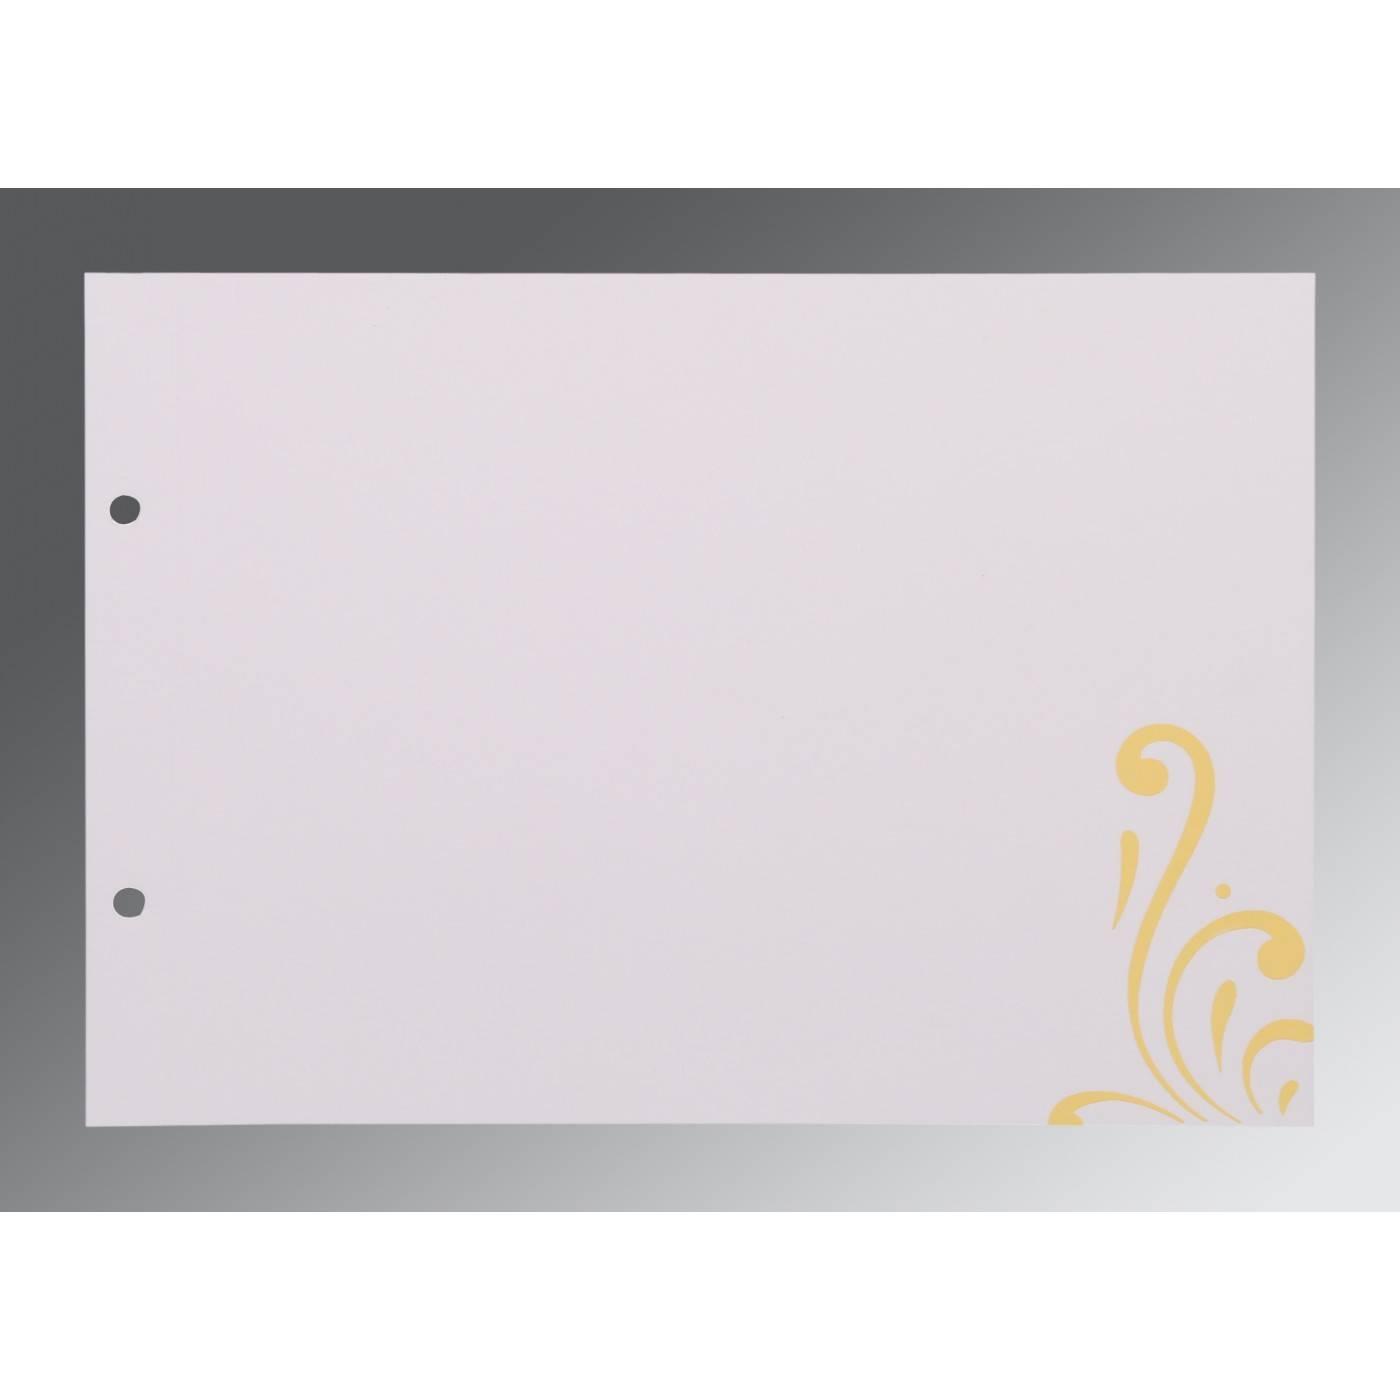 MUSTARD YELLOW SHIMMERY SCREEN PRINTED WEDDING CARD : CIN-8223D - IndianWeddingCards